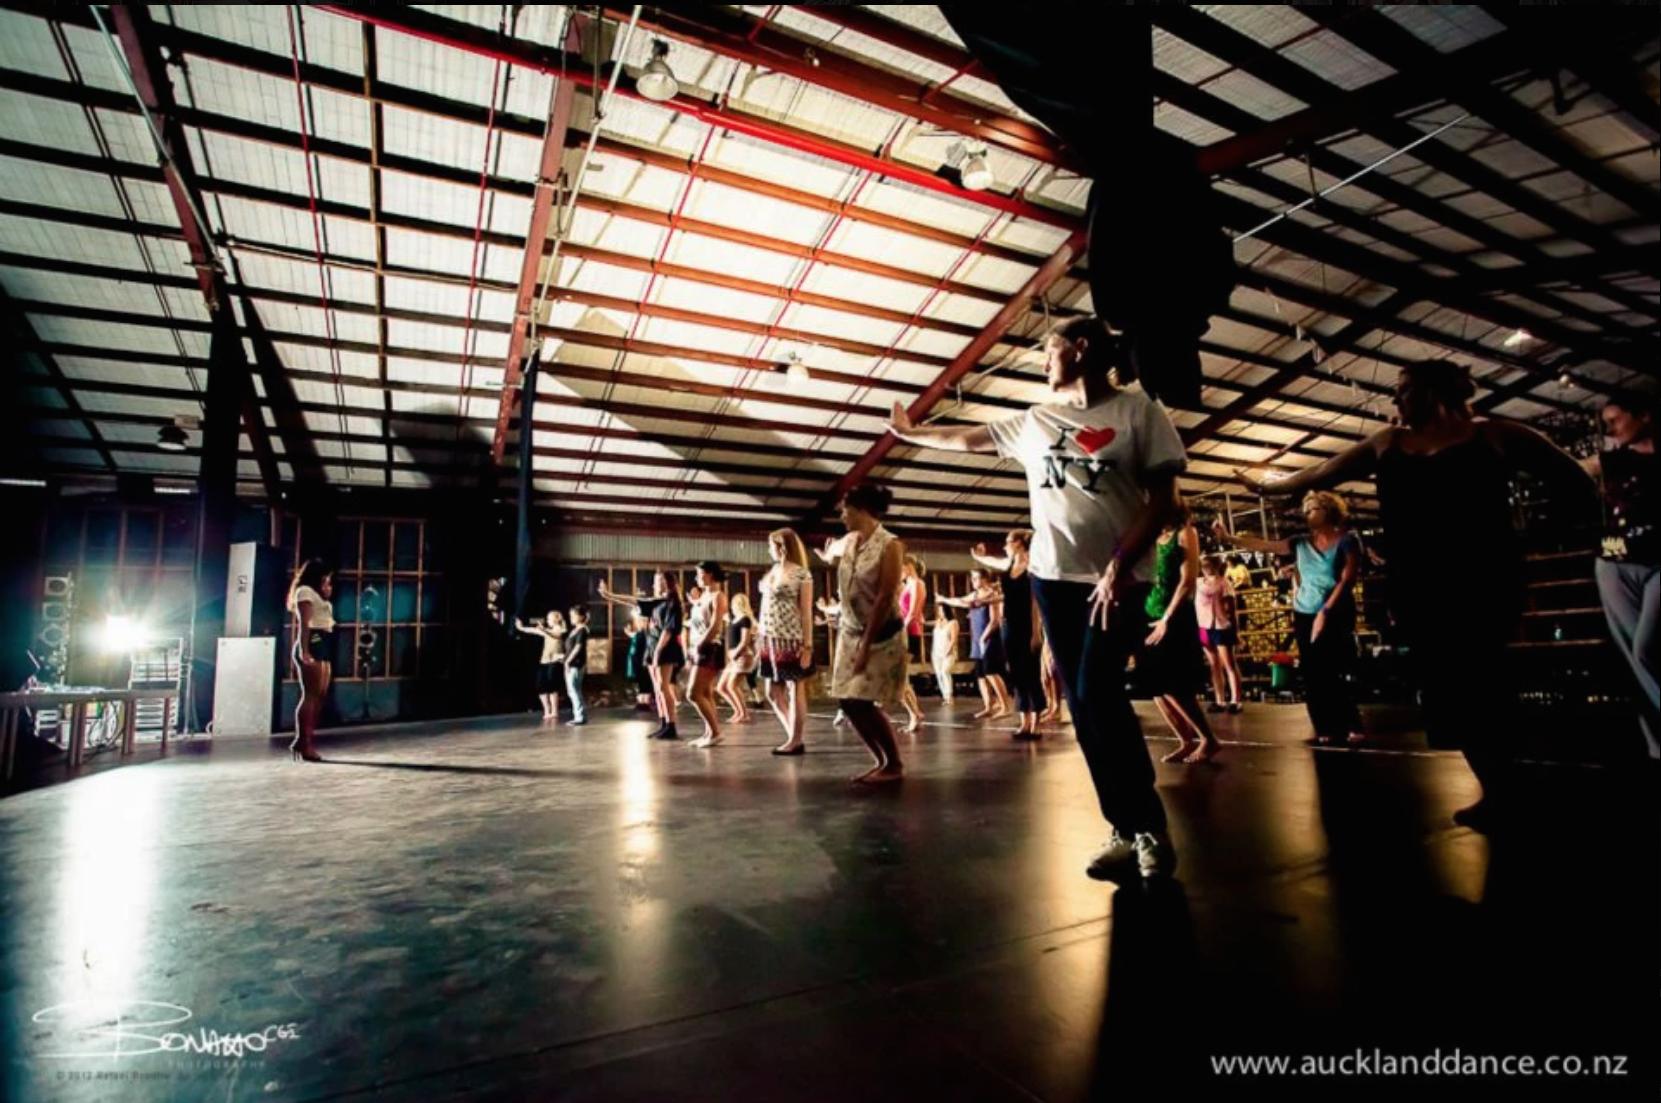 Auckland Dance Company - Dance Workshops